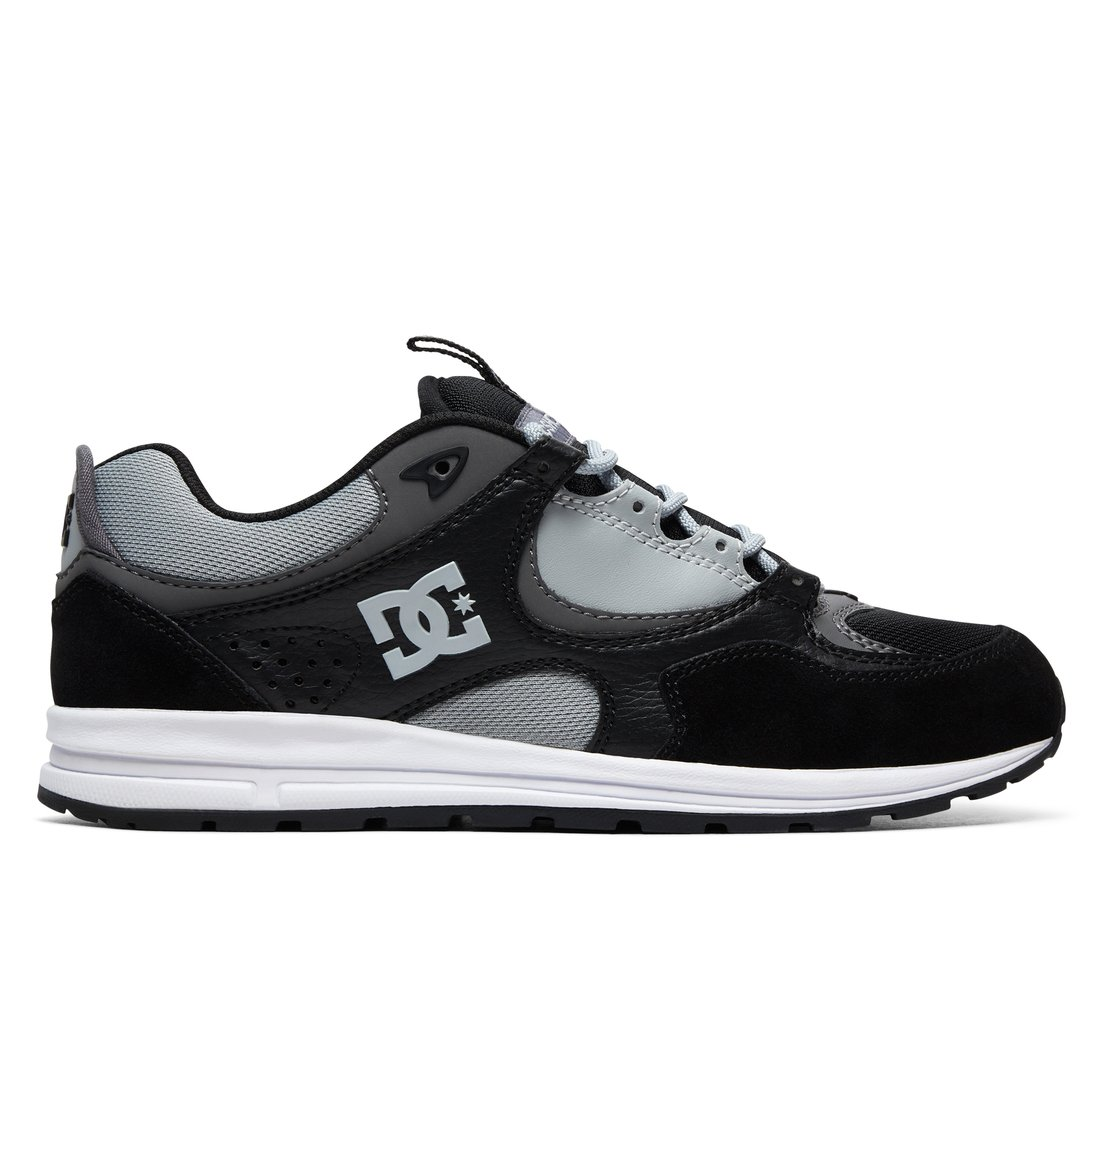 Adys100382Dc Lite Shoes Se Lite Shoes Kalis Kalis Se EDH9I2WeY